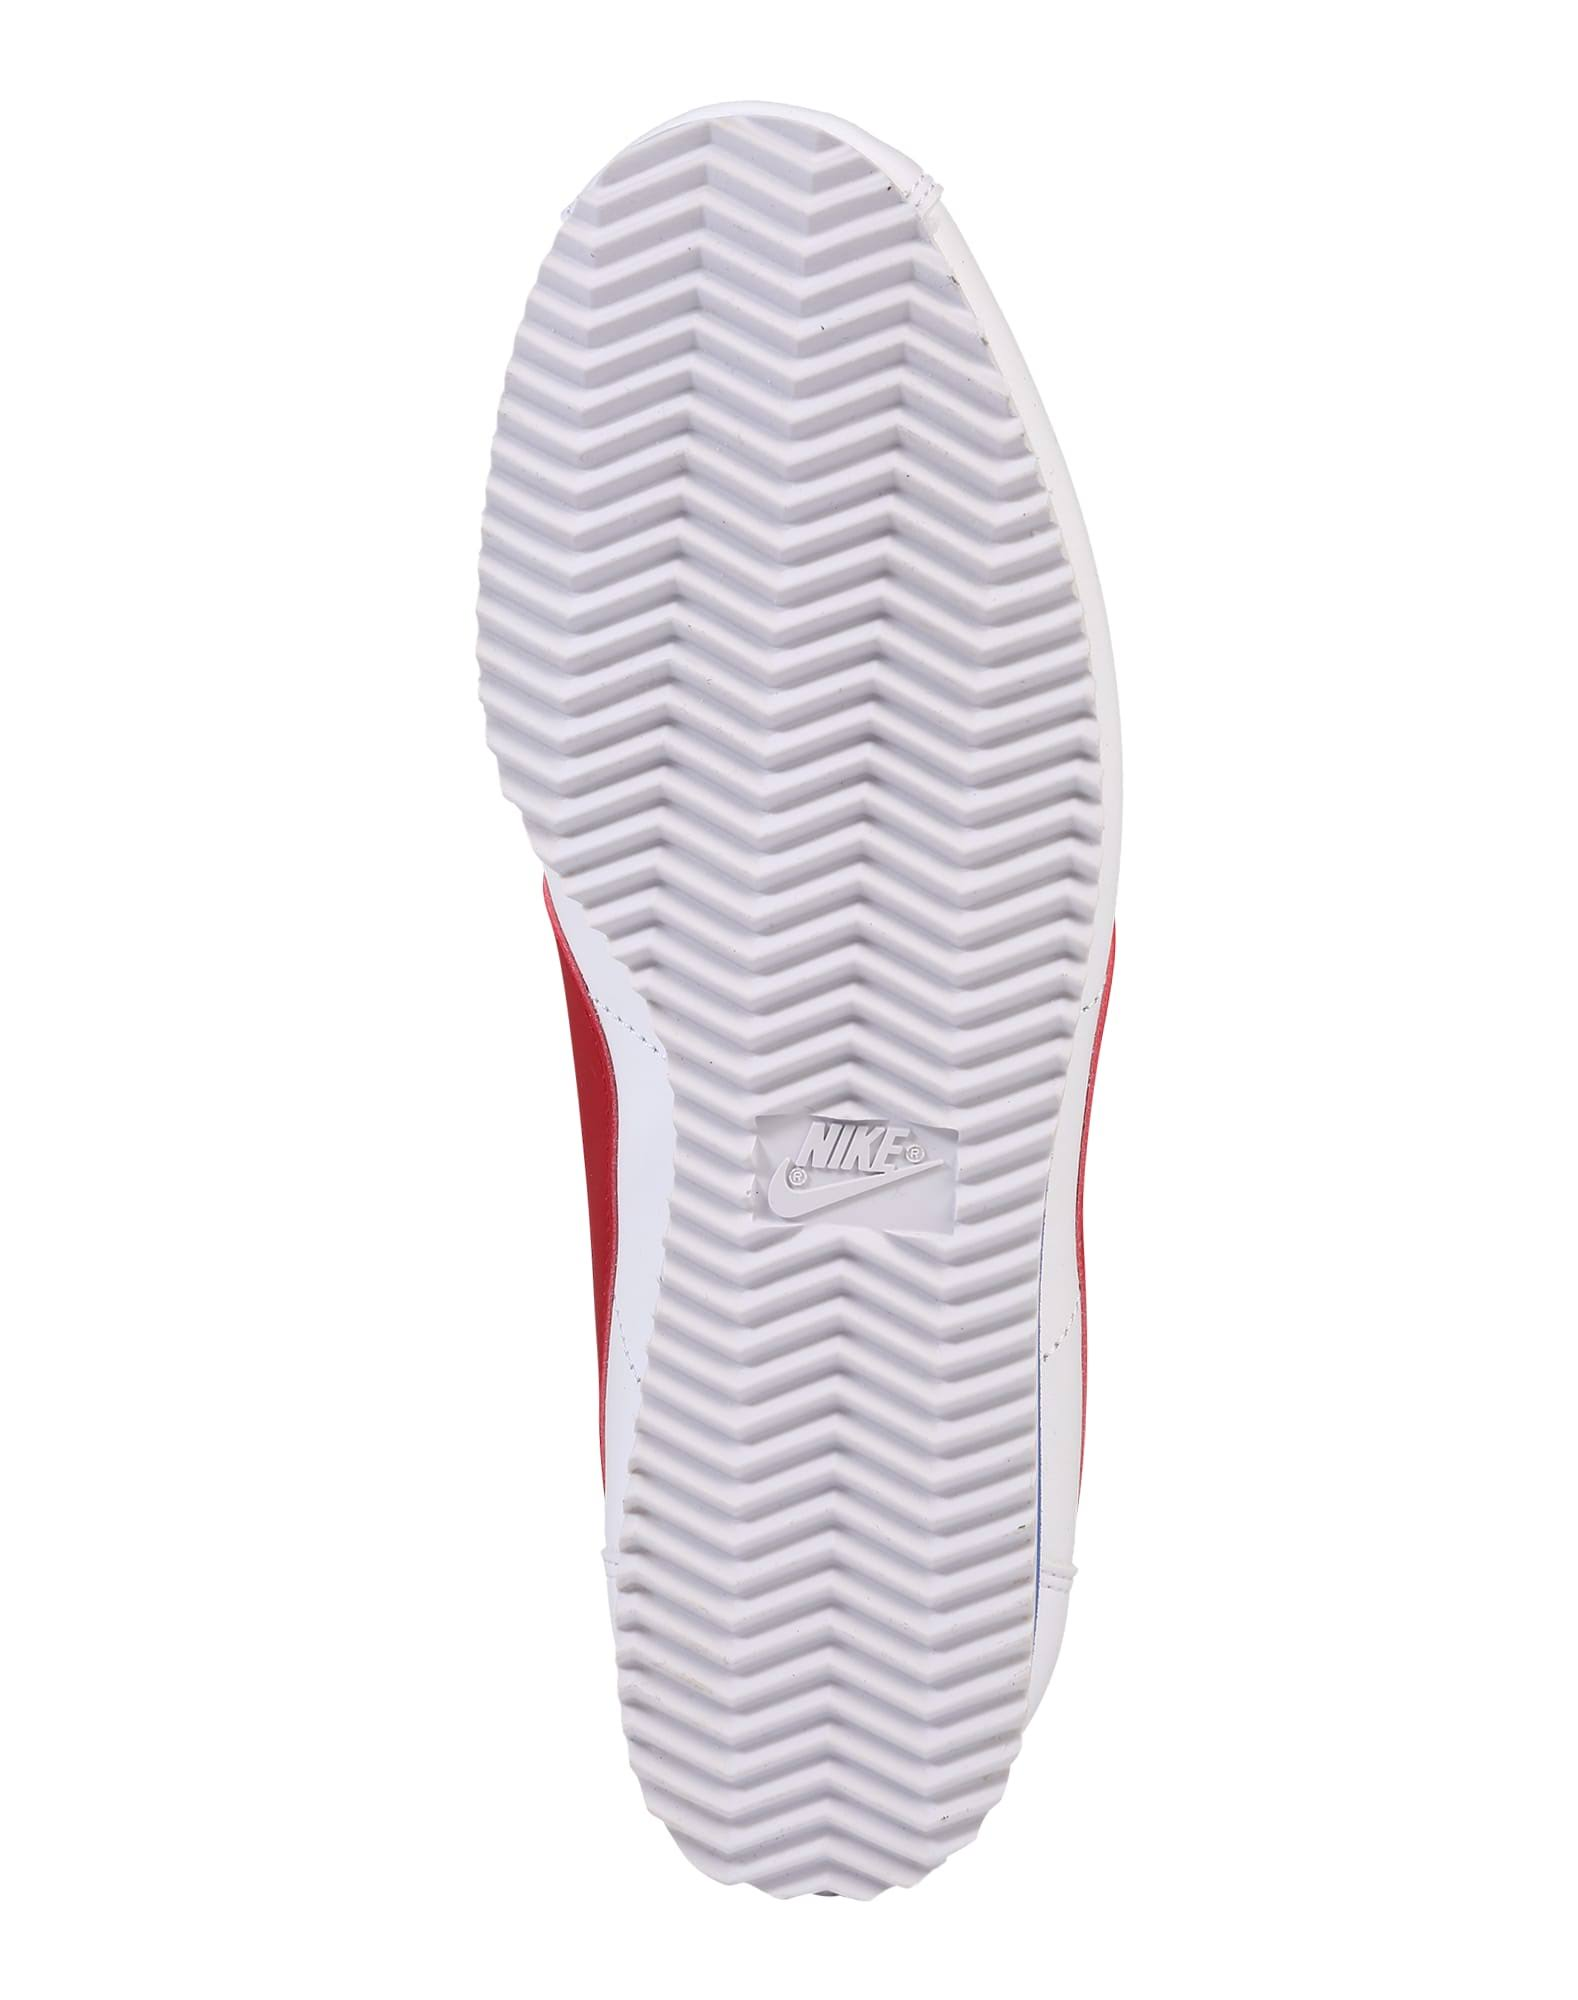 Nike rot blau Weiß Damen Classic Leather Blau Rot Weiß Schuhe Cortez wS6q1Bwr